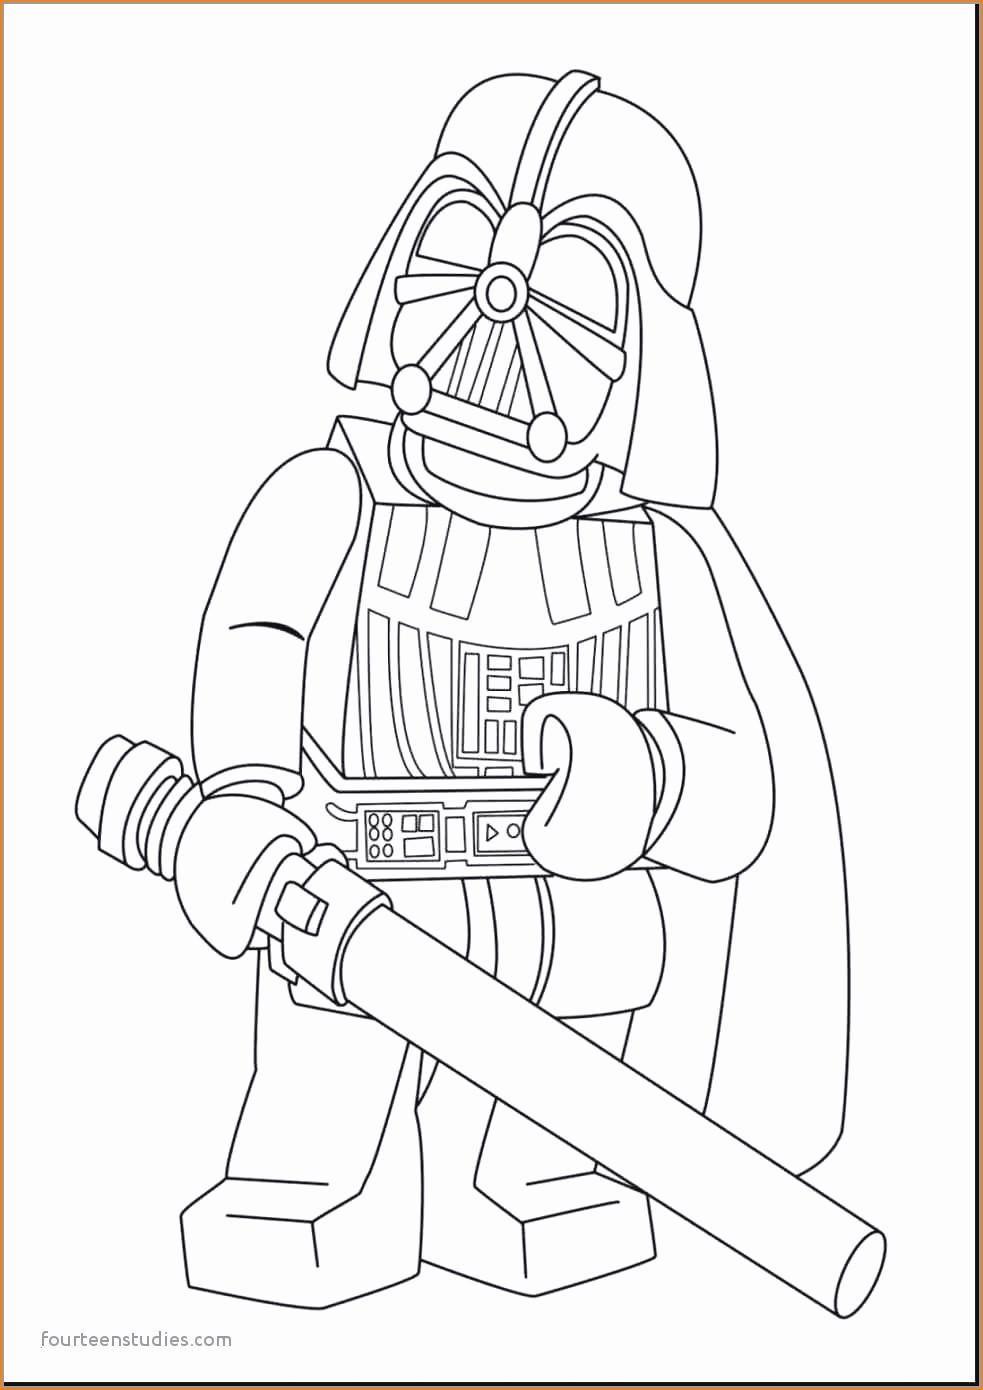 Star Wars Ausmalbilder Yoda Genial Meister Yoda Ausmalbilder Best Star Wars Malvorlagen Das Beste Neu Sammlung